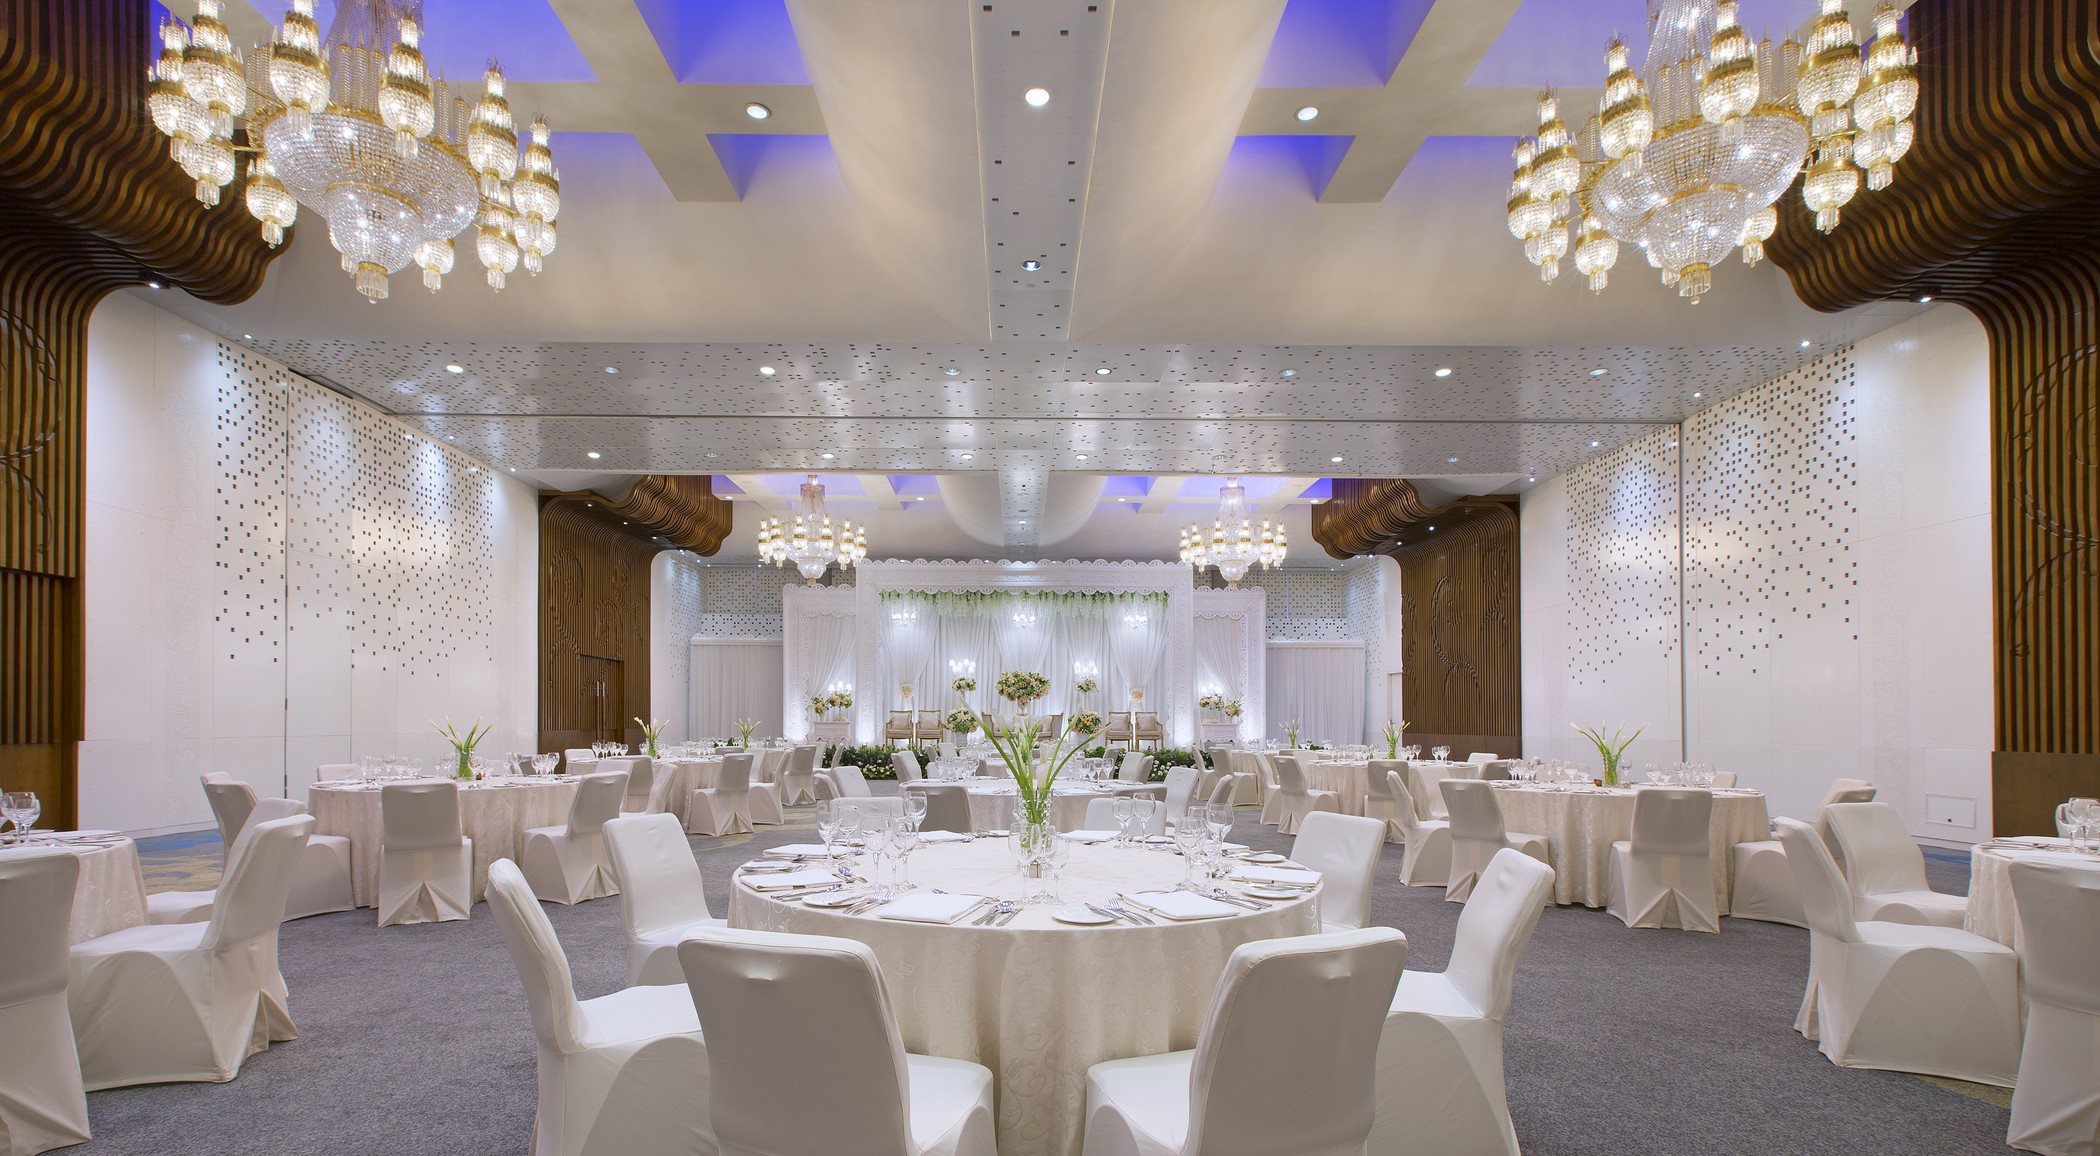 Mandarin oriental jakarta wedding venue in jakarta bridestory junglespirit Choice Image